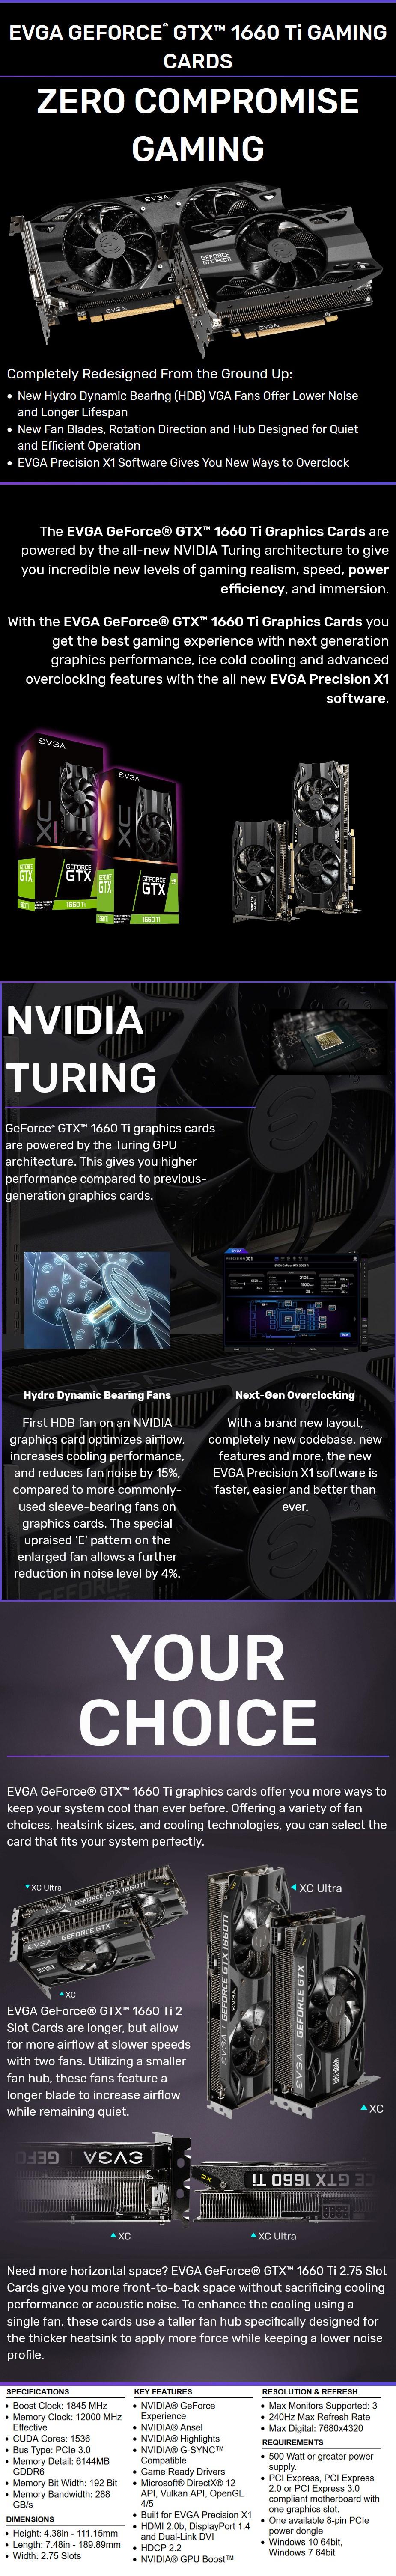 EVGA GeForce GTX 1660 Ti XC GAMING 6GB Video Card - Desktop Overview 1